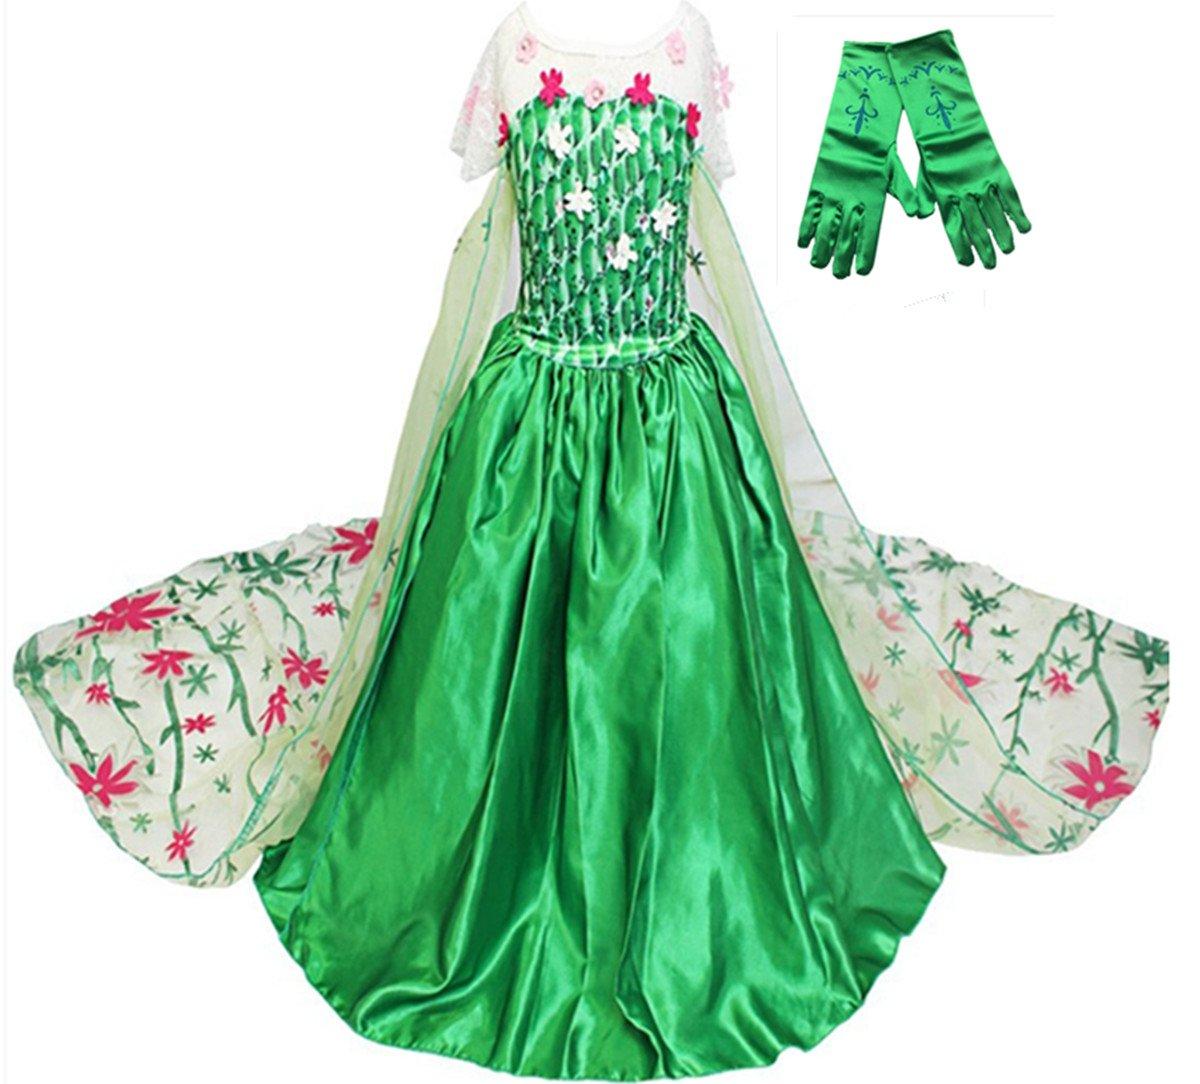 GenialES Prinzessin Kleid Handschuhe Grün Kostüm Karneval ...